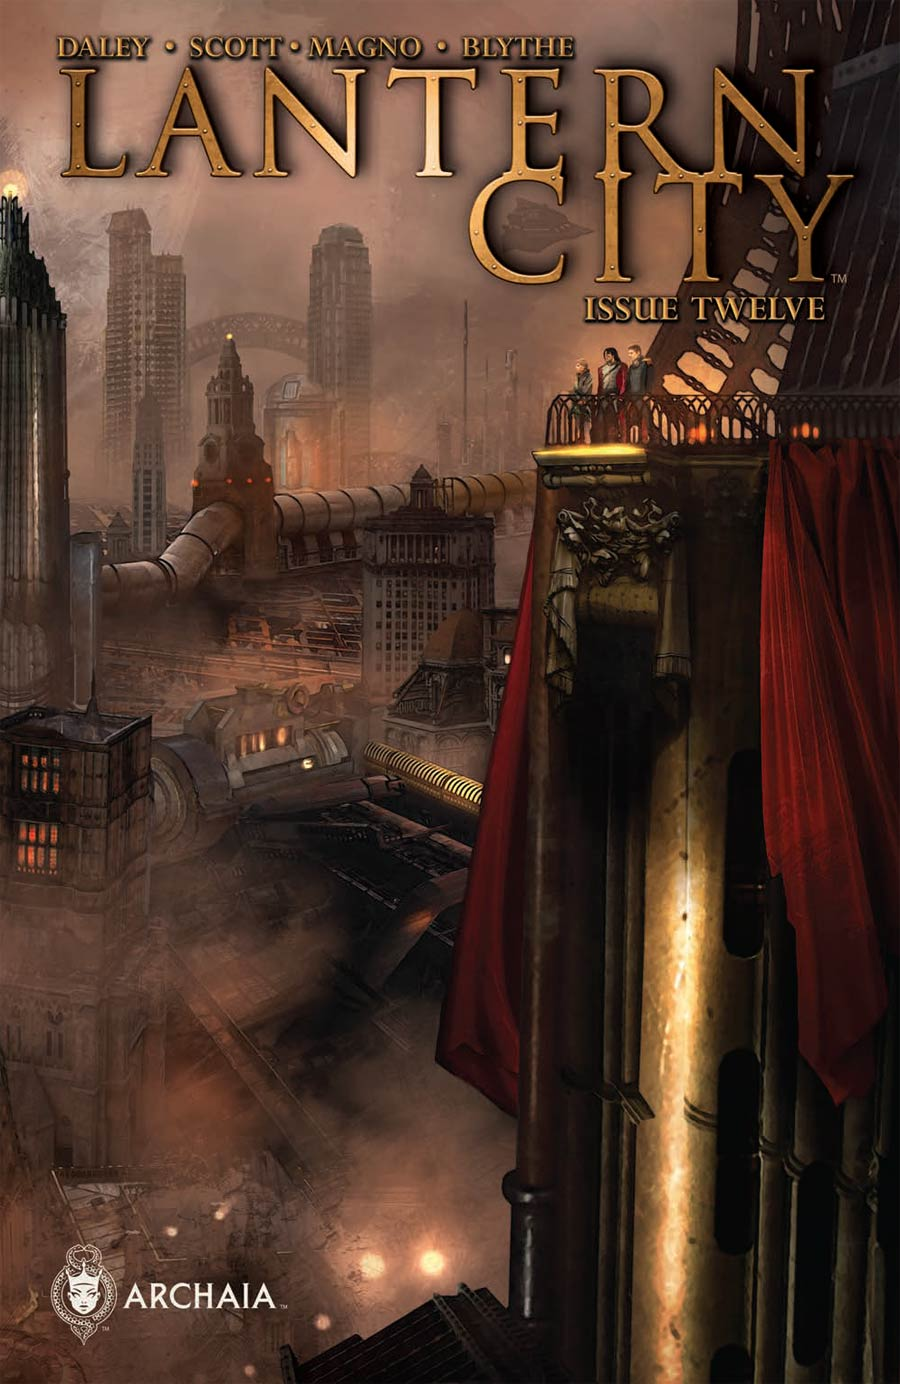 Lantern City #12 Cover A Regular Benjamin Carre Cover